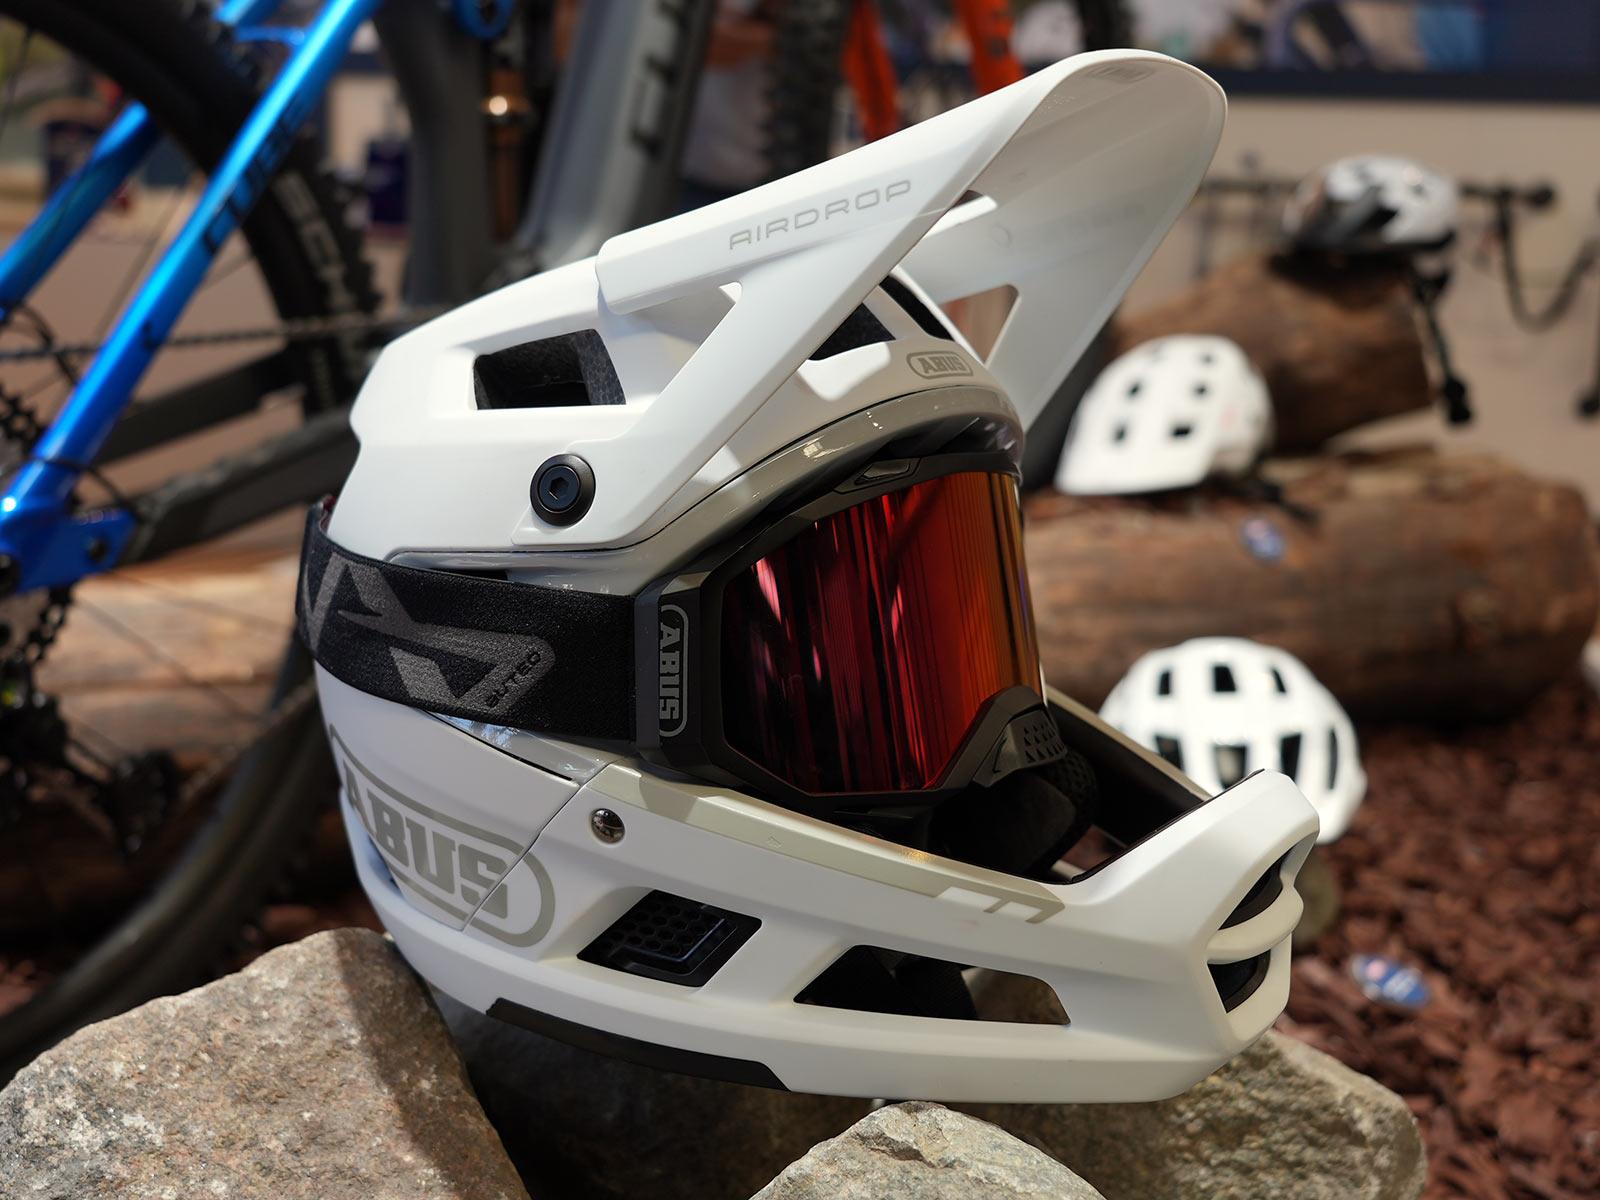 abus airdrop full face mountain bike helmet